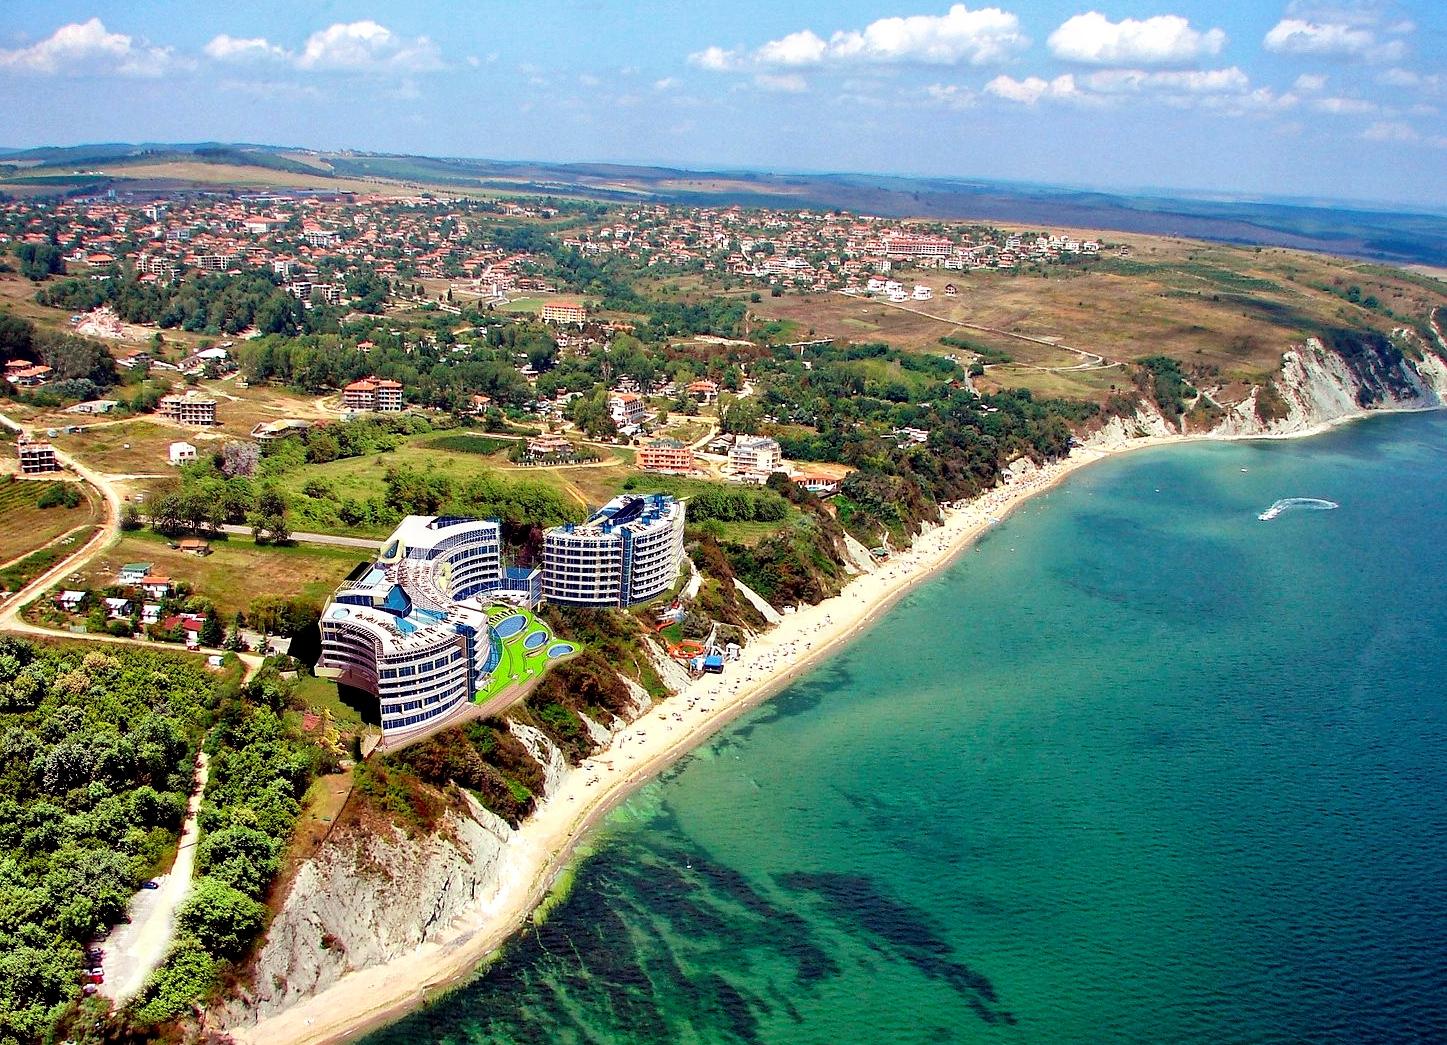 Бяла болгария фото города и пляжа